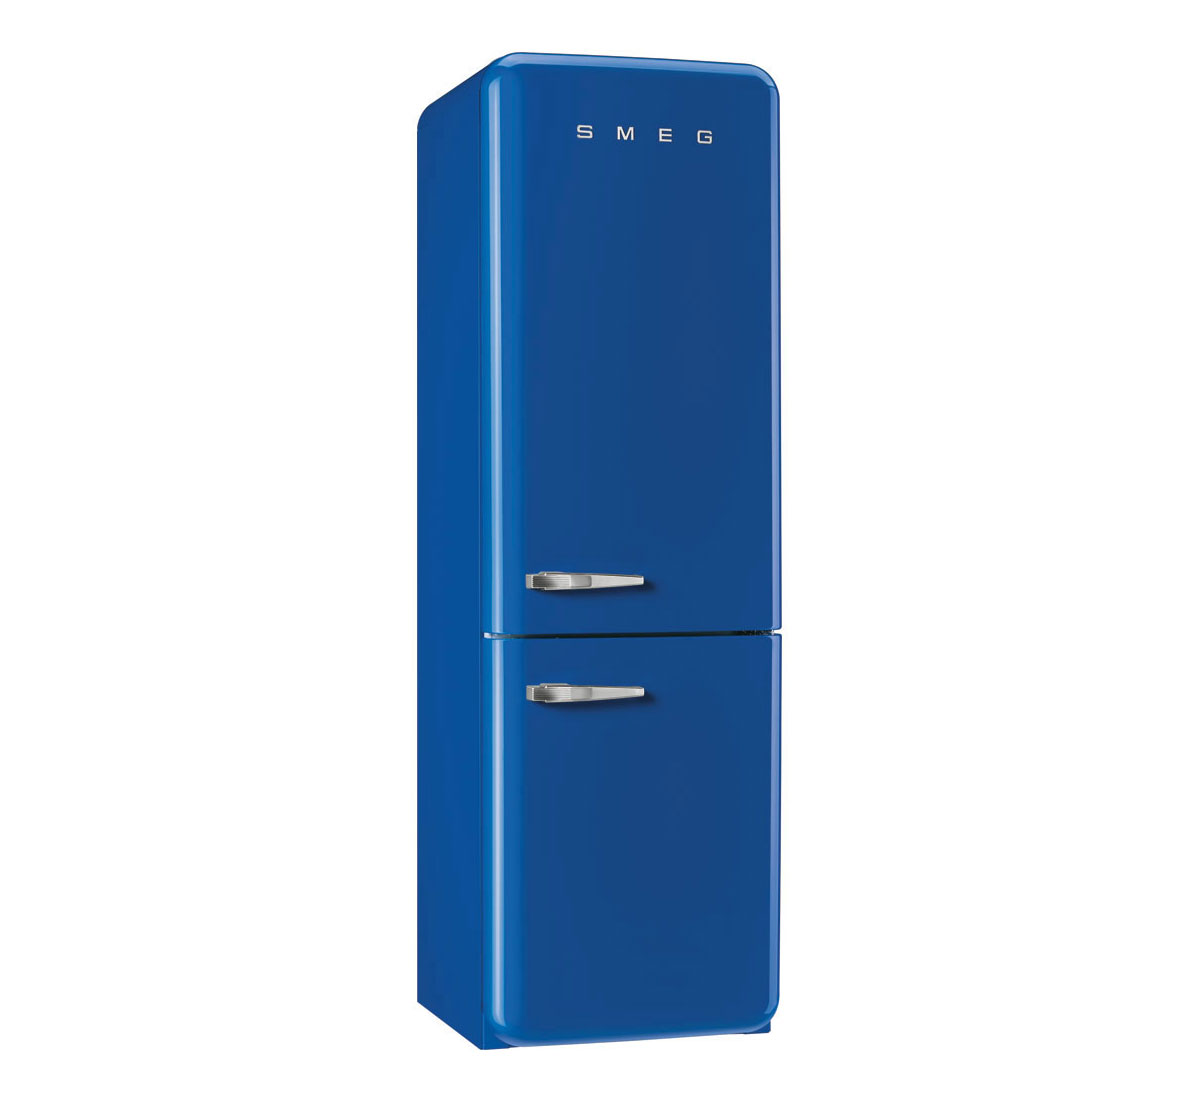 Anni 50 Frigorifero Smeg fab 32 refrigerator '50 blue